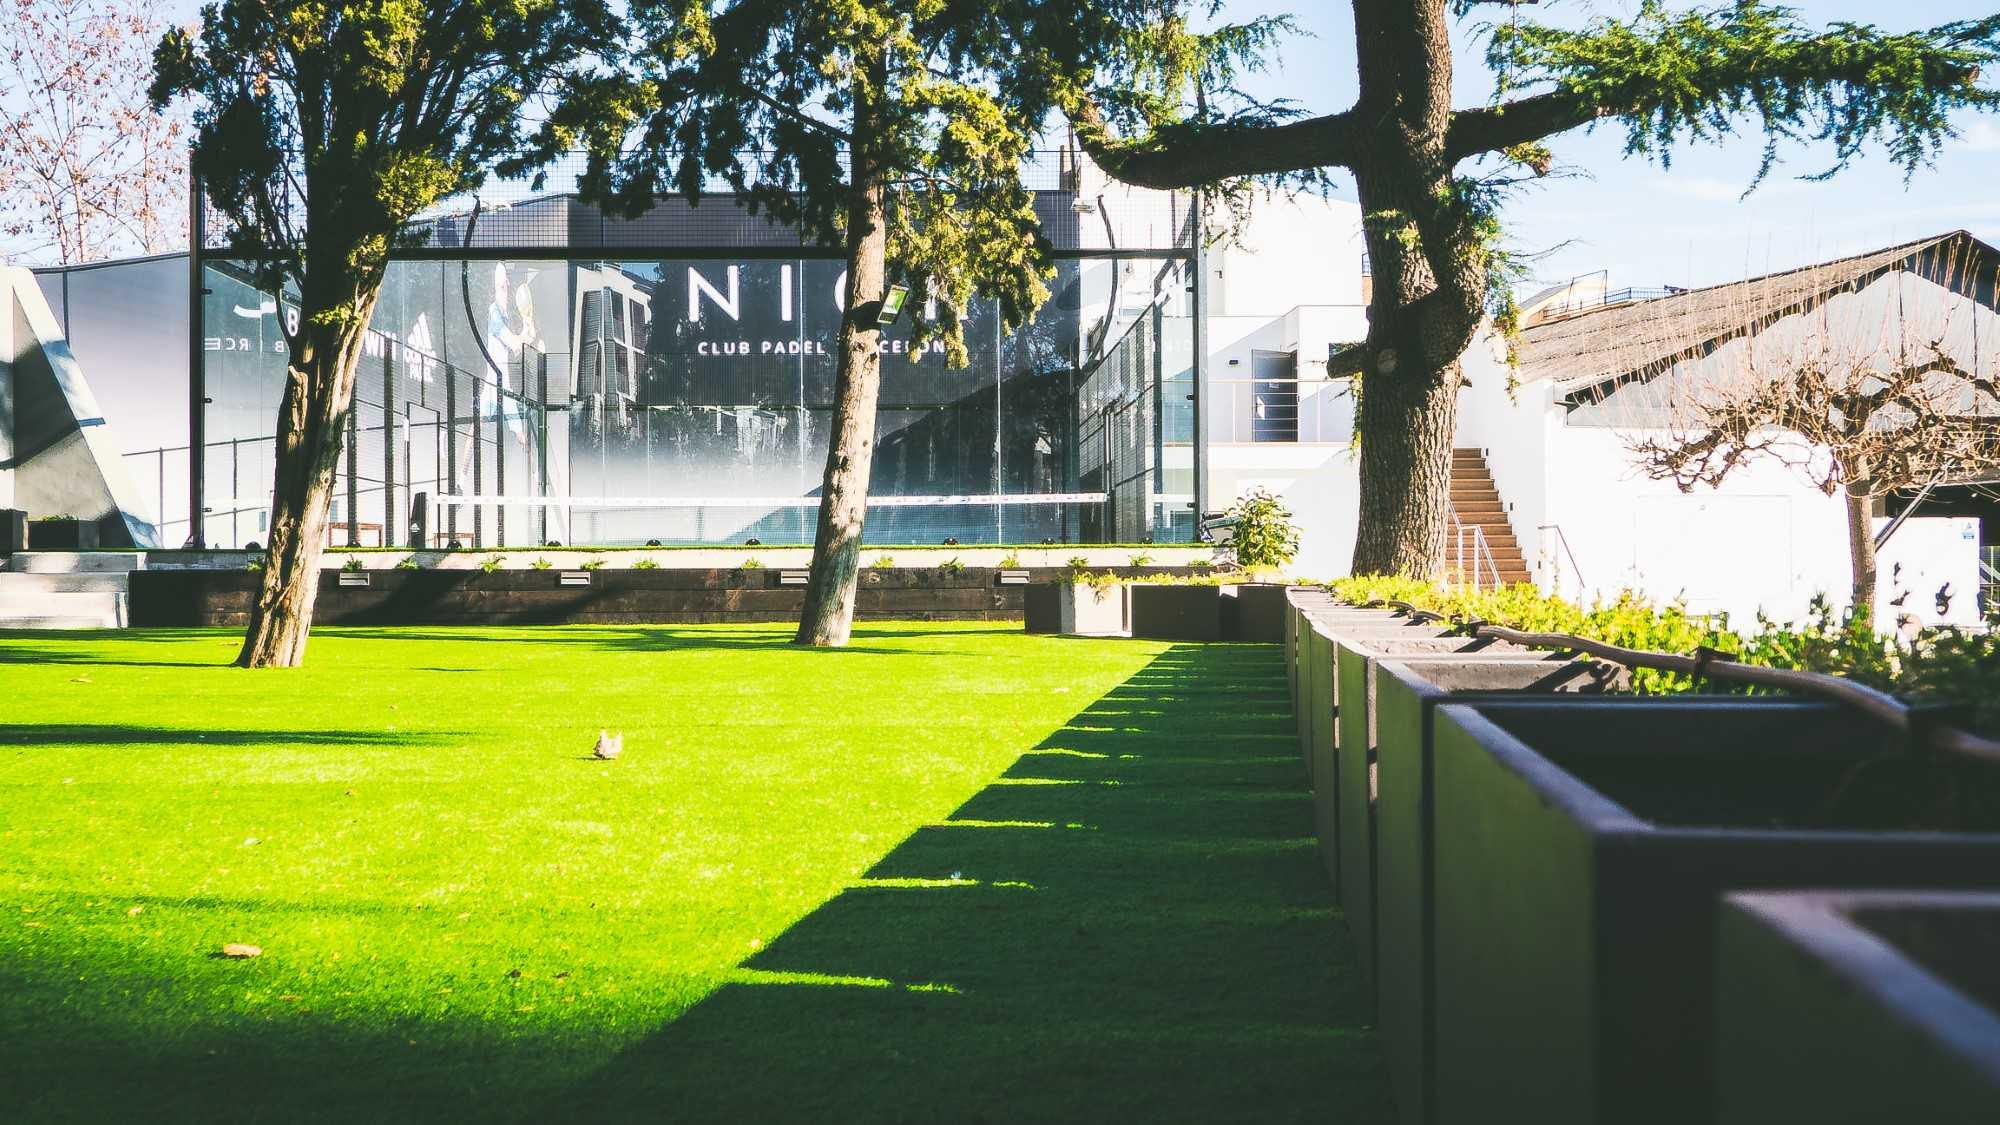 padel nick horta barcelona instalar césped artificial - padelnickhortabarcelona 186 - ¿Cómo instalar césped artificial en terreno desnivelado?